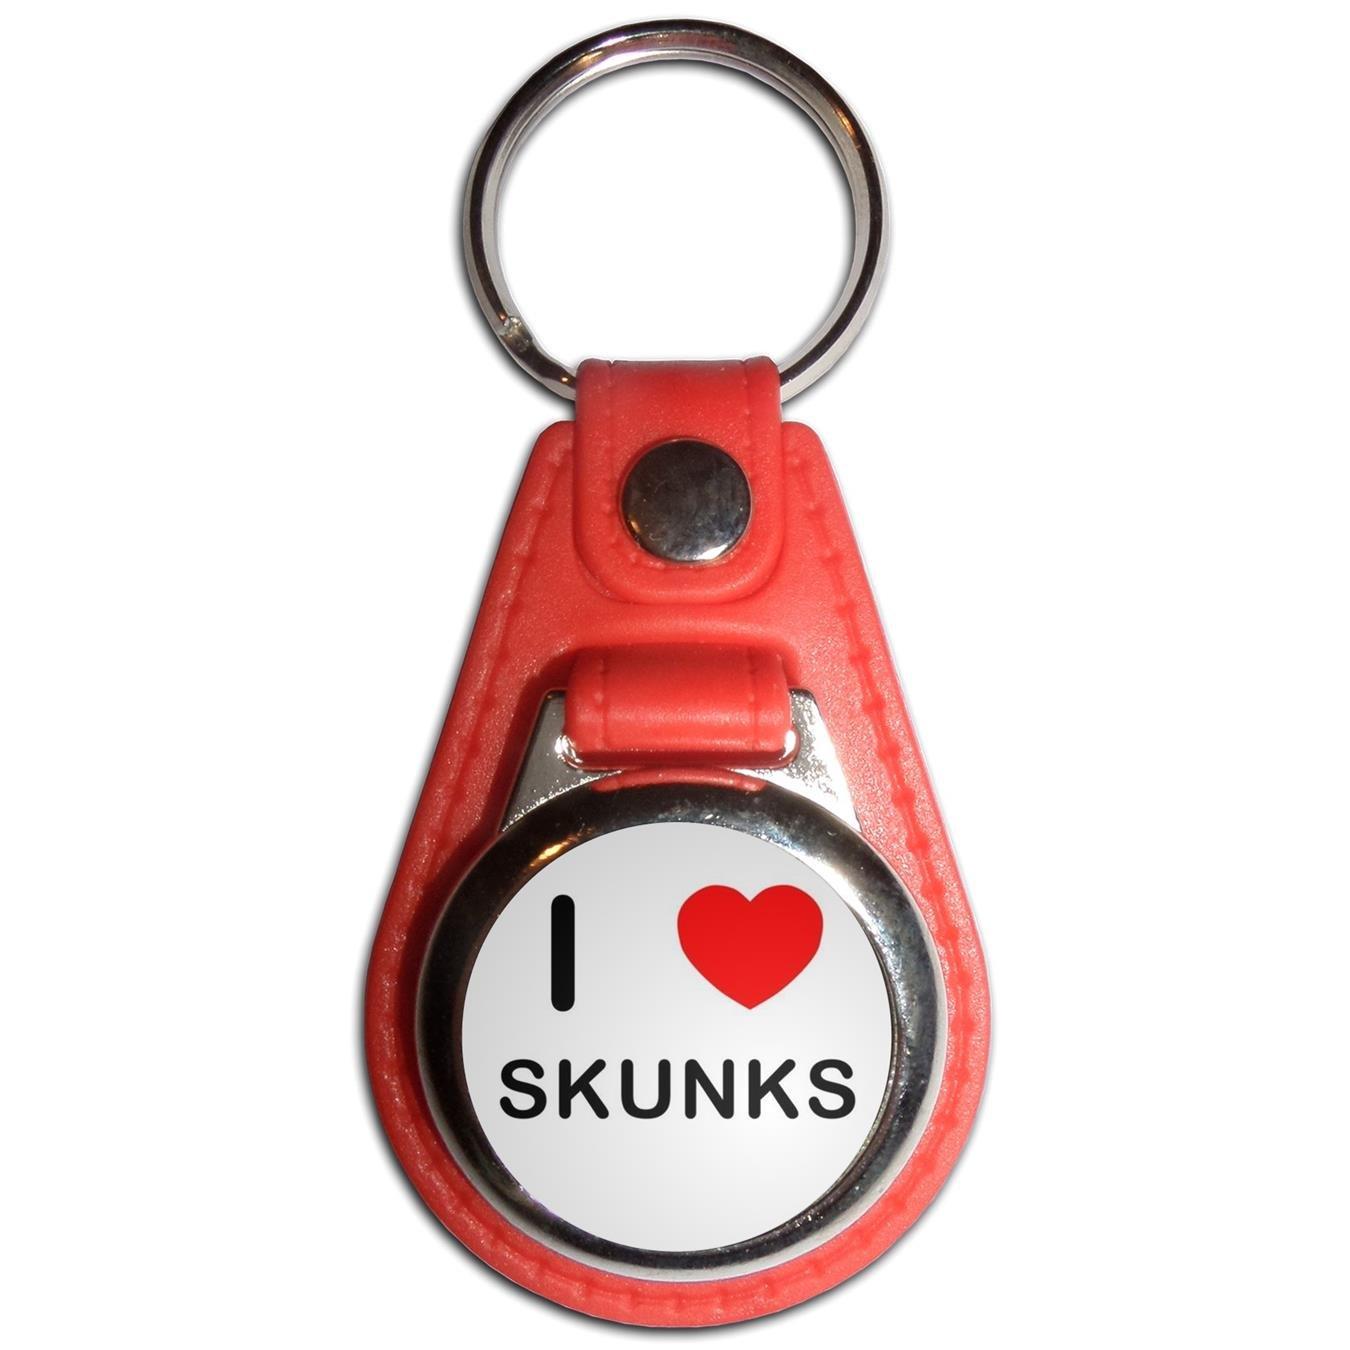 I Love Skunks - Blue Plastic / Metal Medallion Coulor Key Ring BadgeBeast cblu-skunks